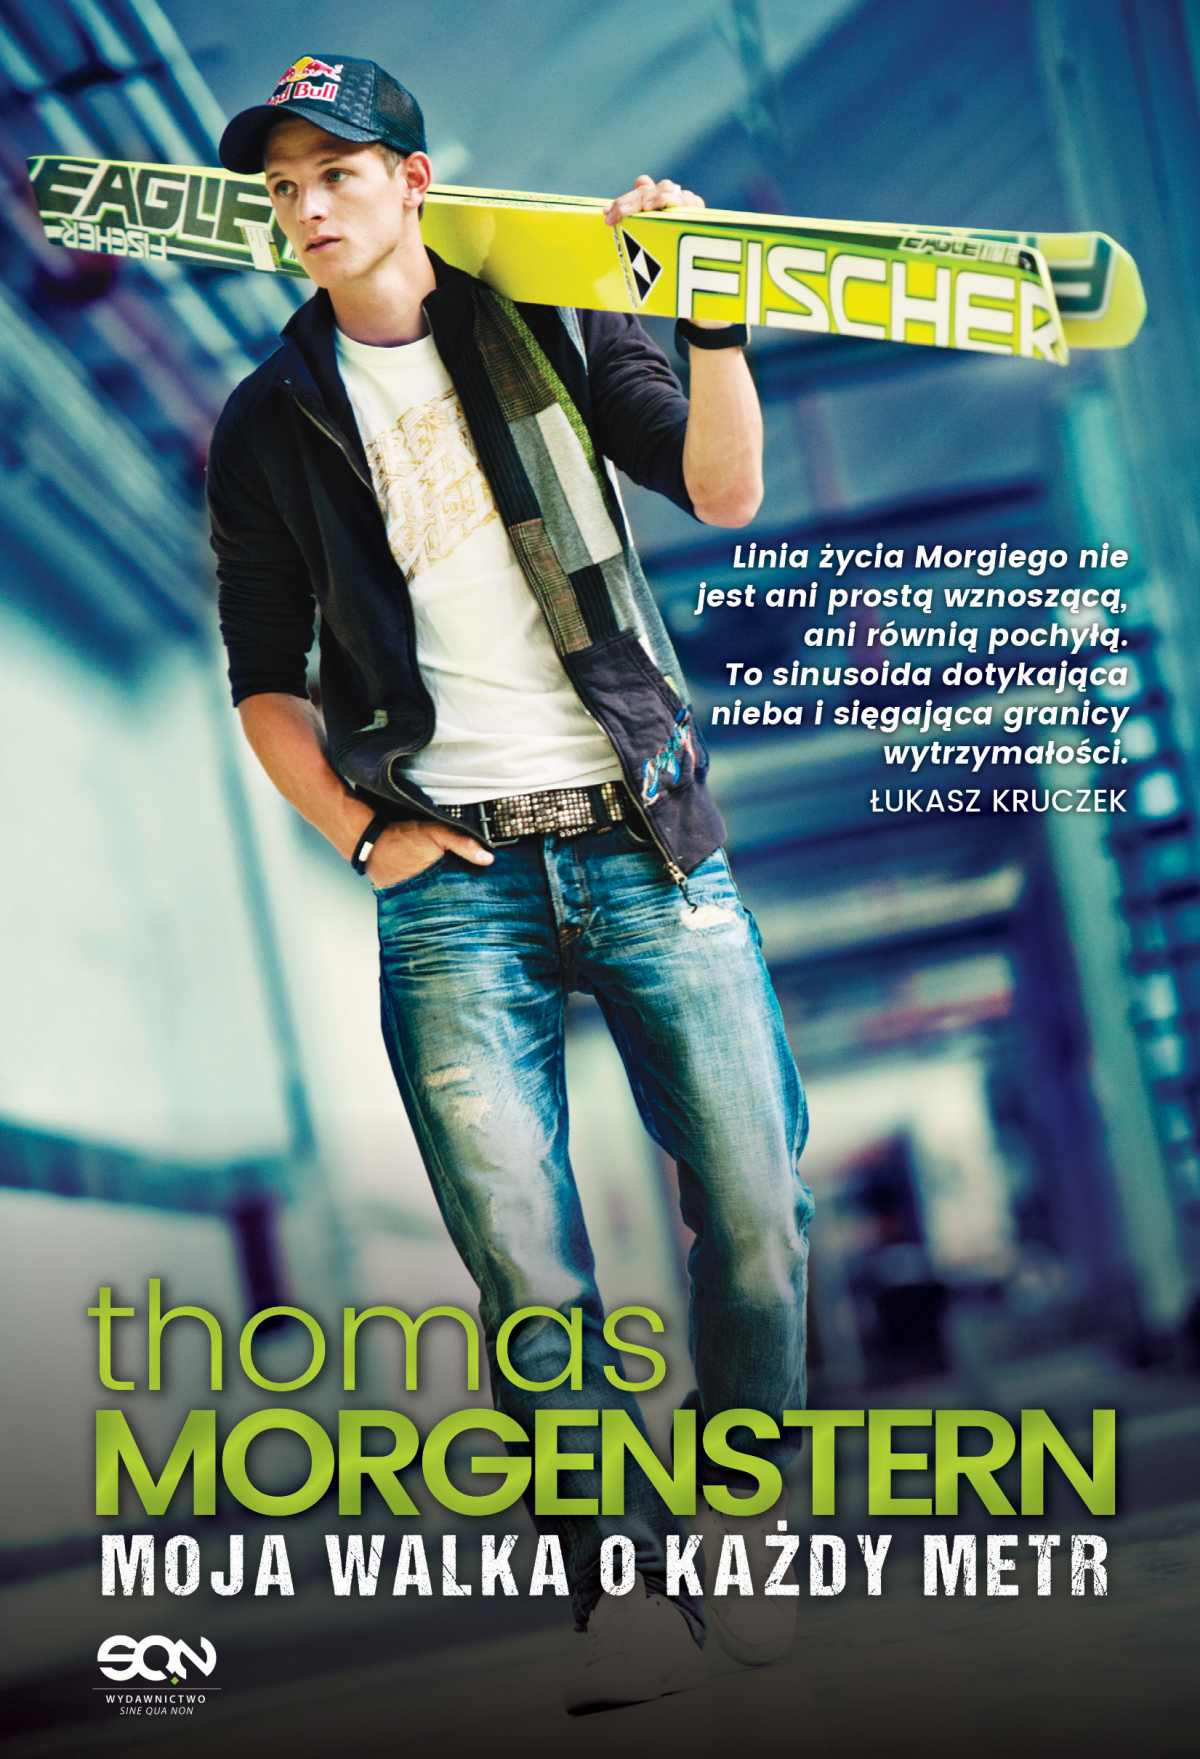 Thomas Morgenstern. Moja walka o każdy metr - Ebook (Książka EPUB) do pobrania w formacie EPUB